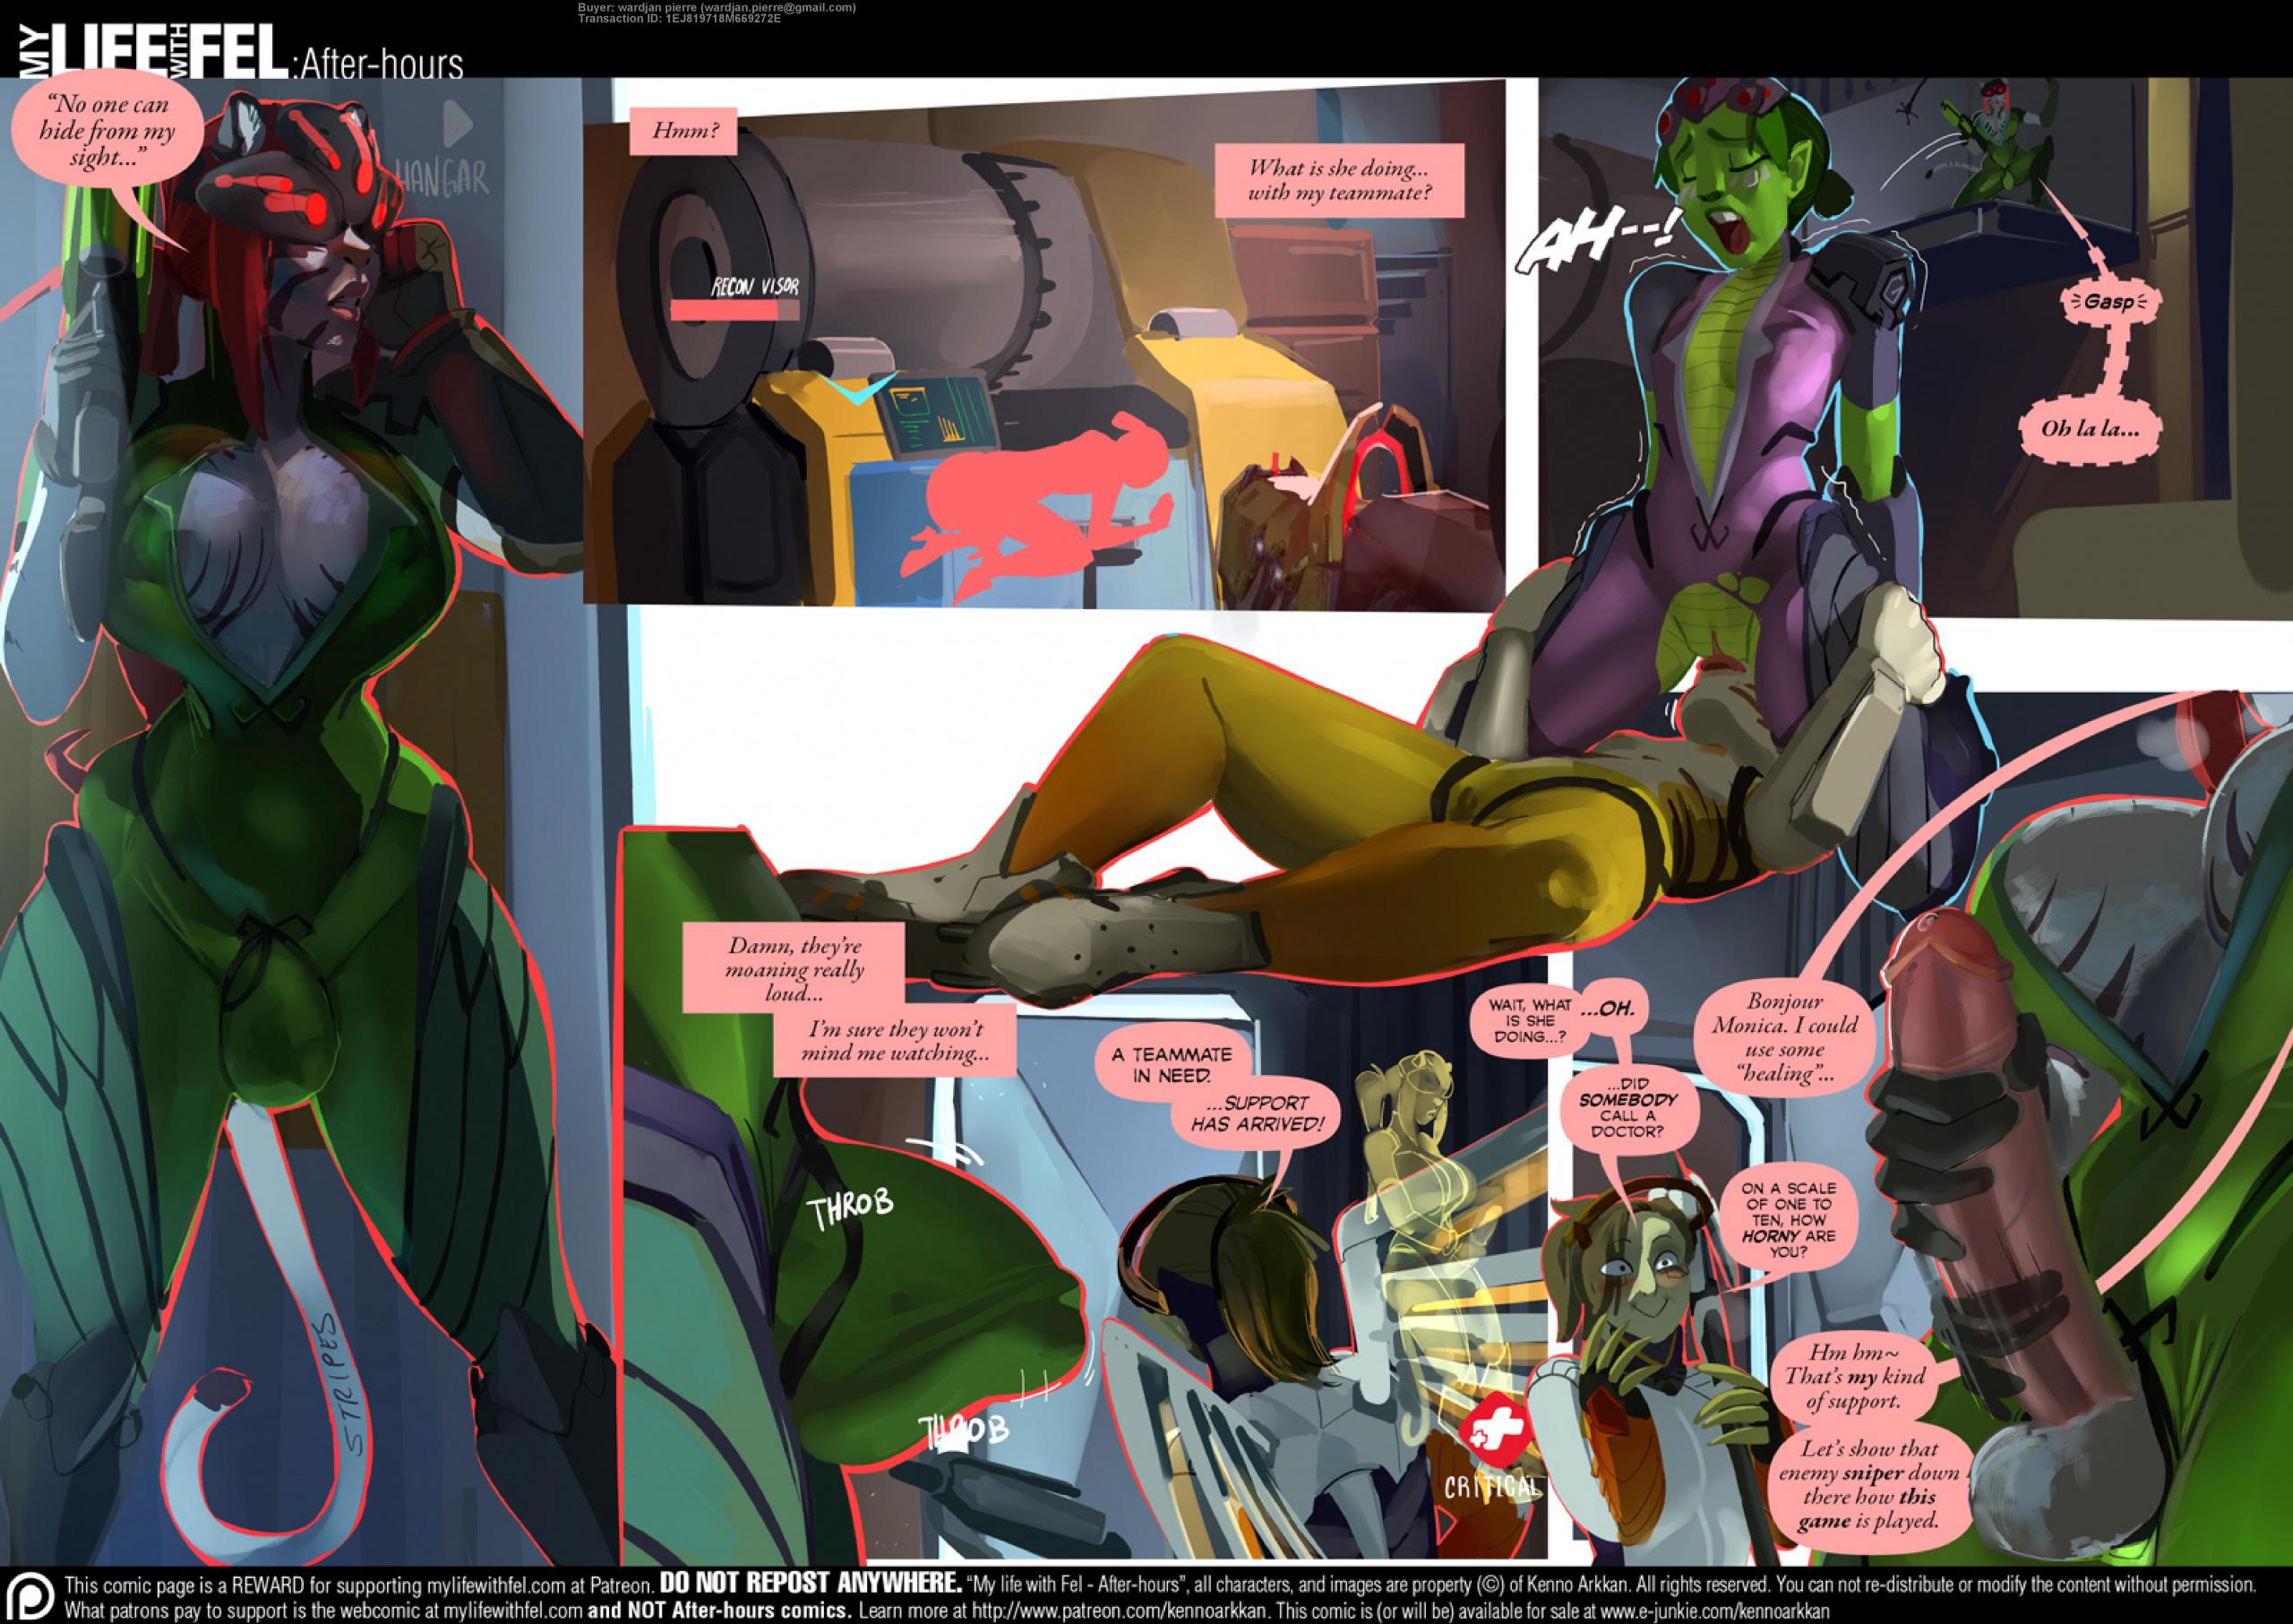 Afterwatch porn comics Oral sex, Anal Sex, Double Penetration, Furry, Futanari, Group Sex, Latex, Lesbians, Sex Toys, Stockings